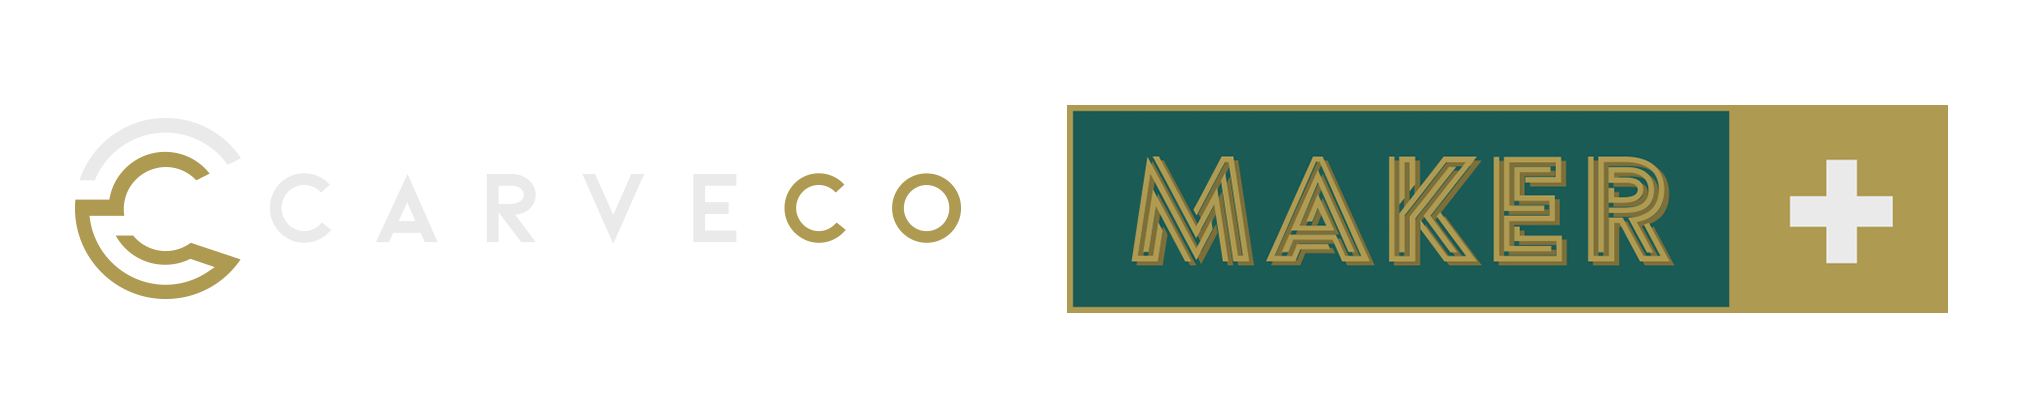 Carveco Maker Plus cnc software logo